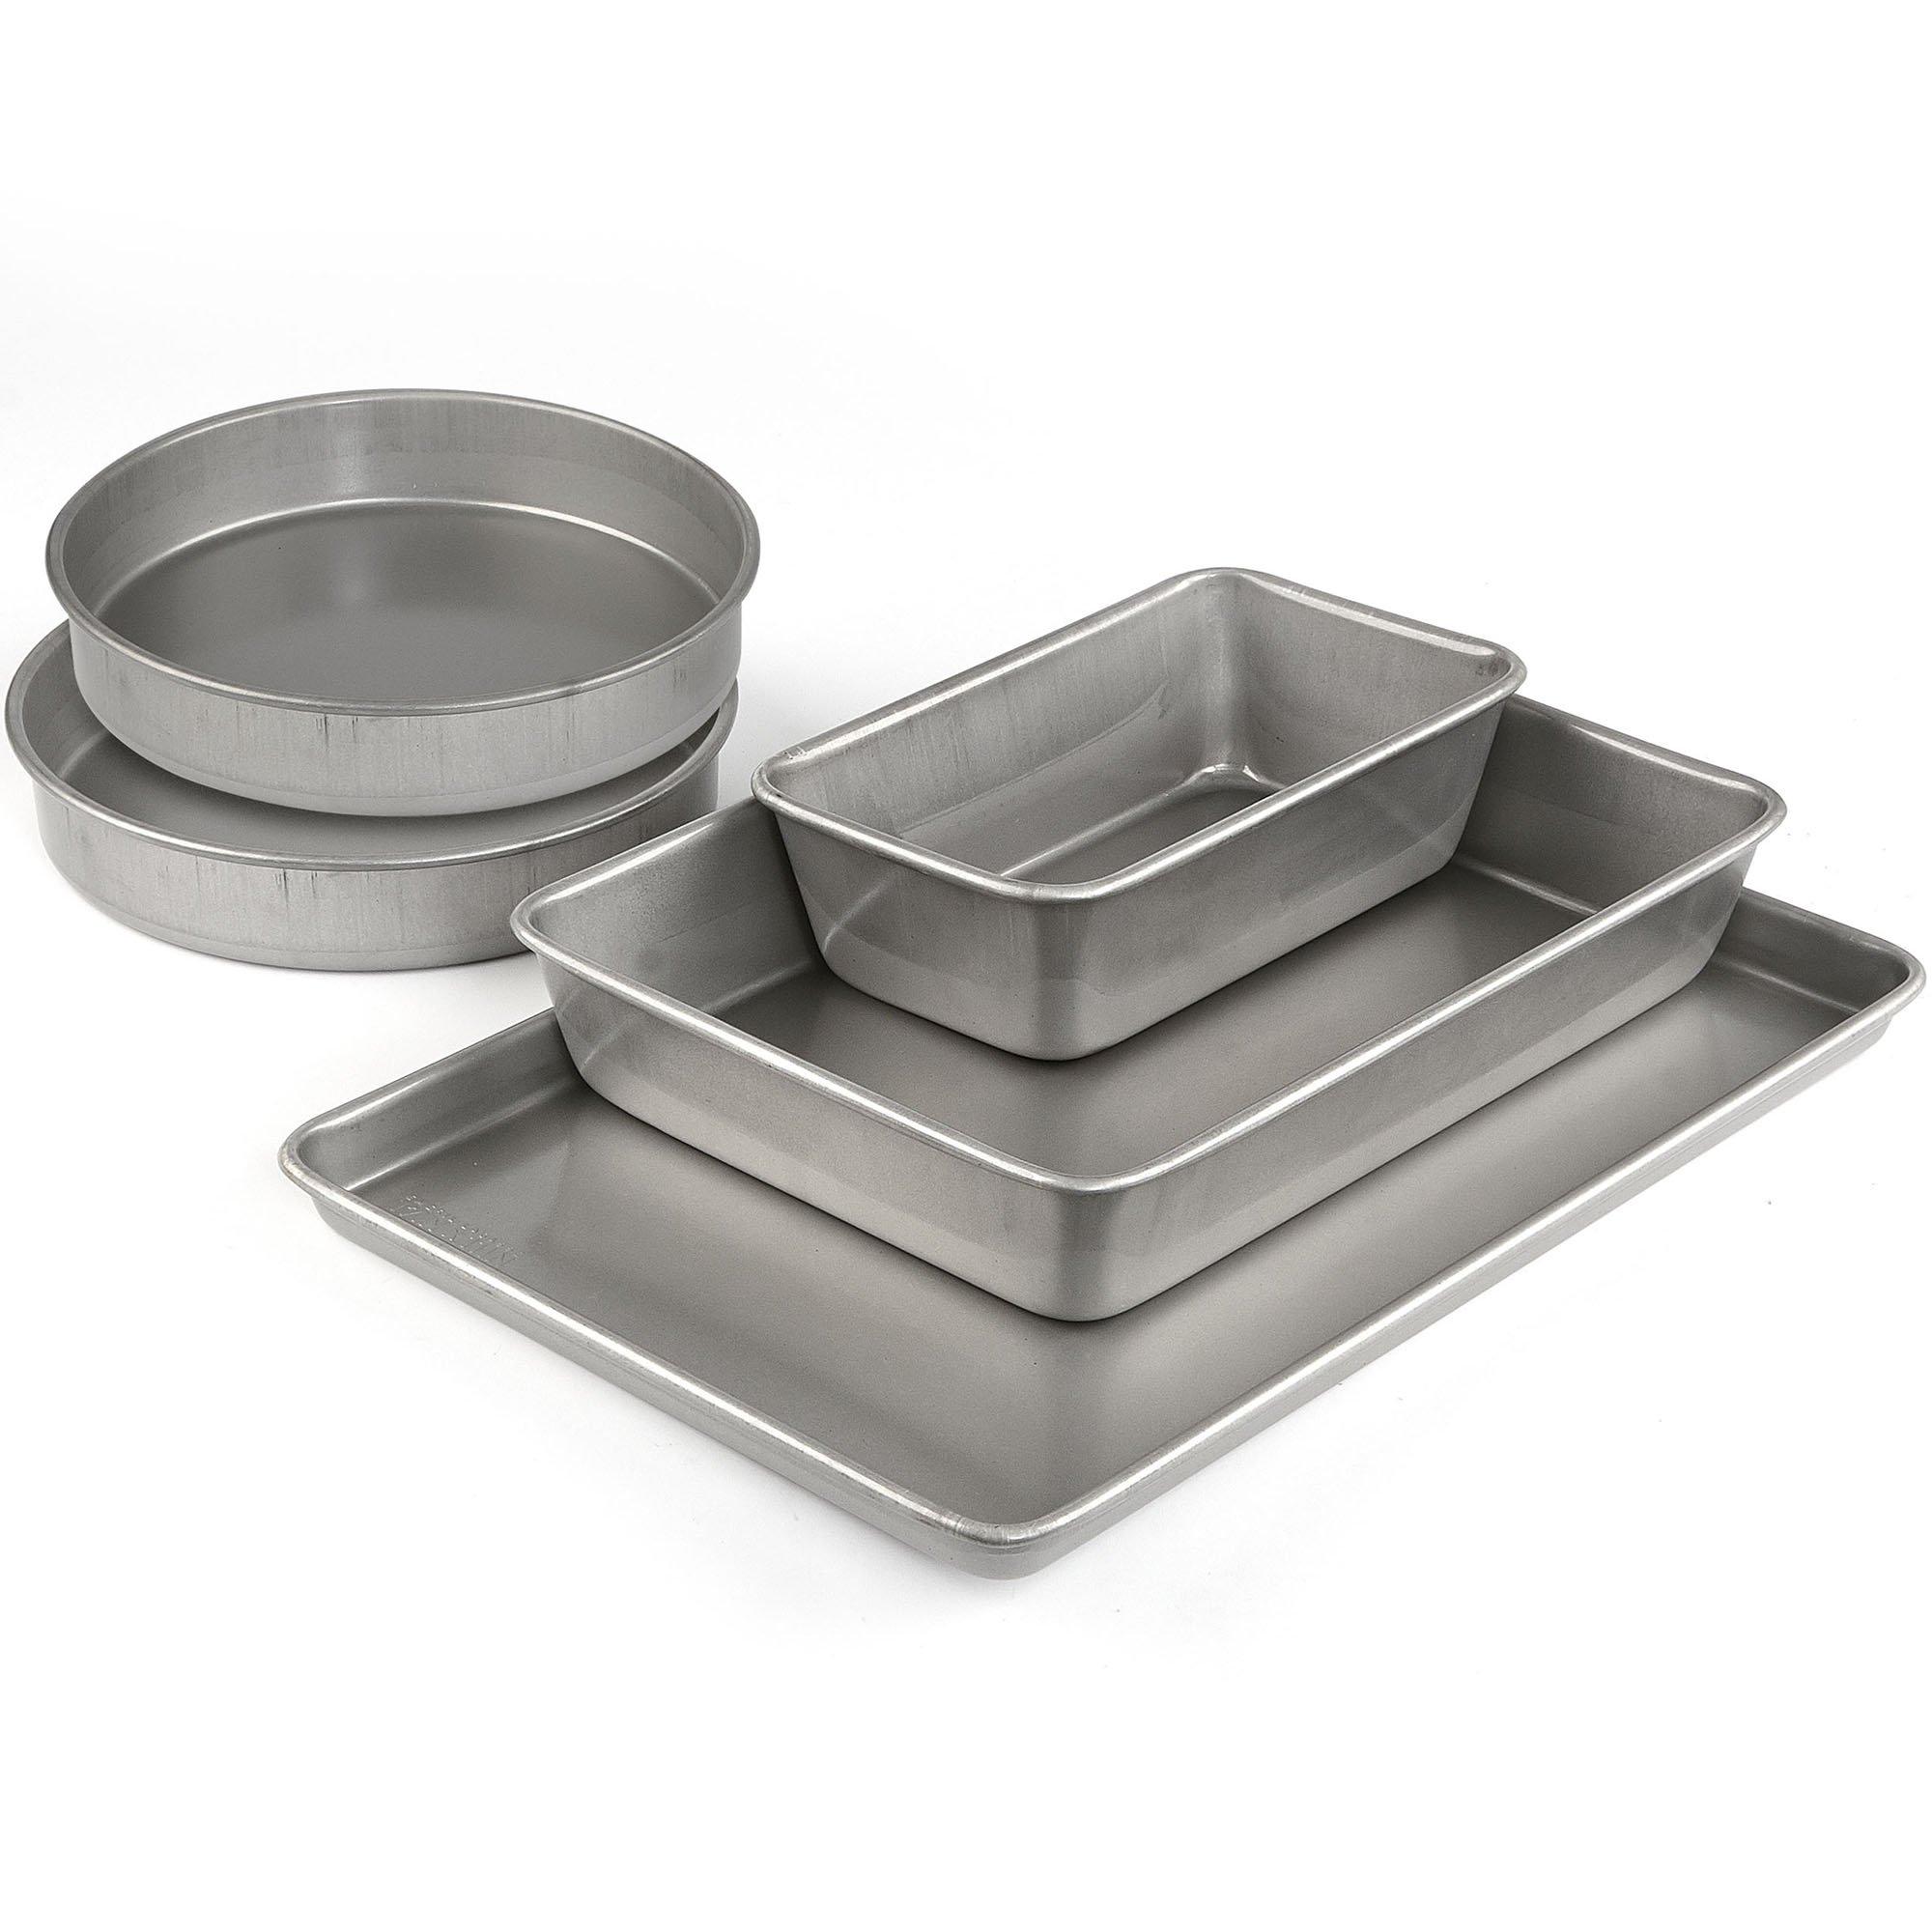 Emeril Lagasse 62670 Aluminized Steel Nonstick 5-Piece Bakeware Set by Emeril Lagasse (Image #13)